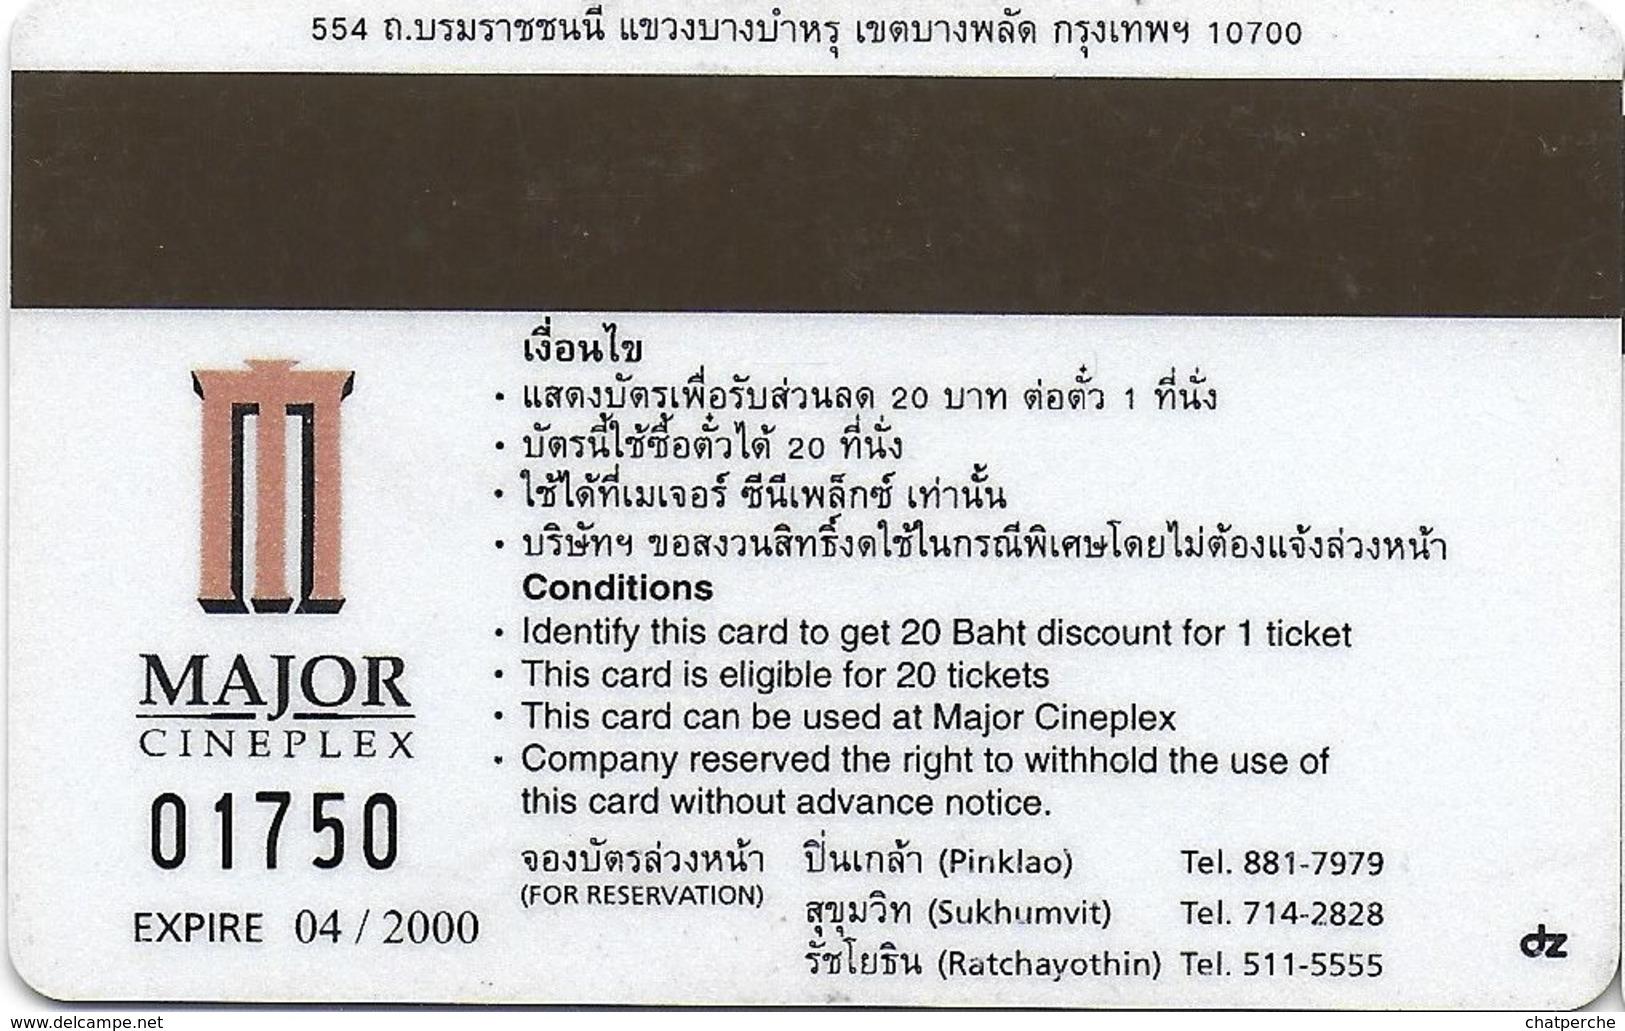 THAÏLANDE CINECARTE PHONECARD CARTE BANDE MAGNETIQUE 8 MM  04/2000  MAJOR CINEPLEX - Thaïlande